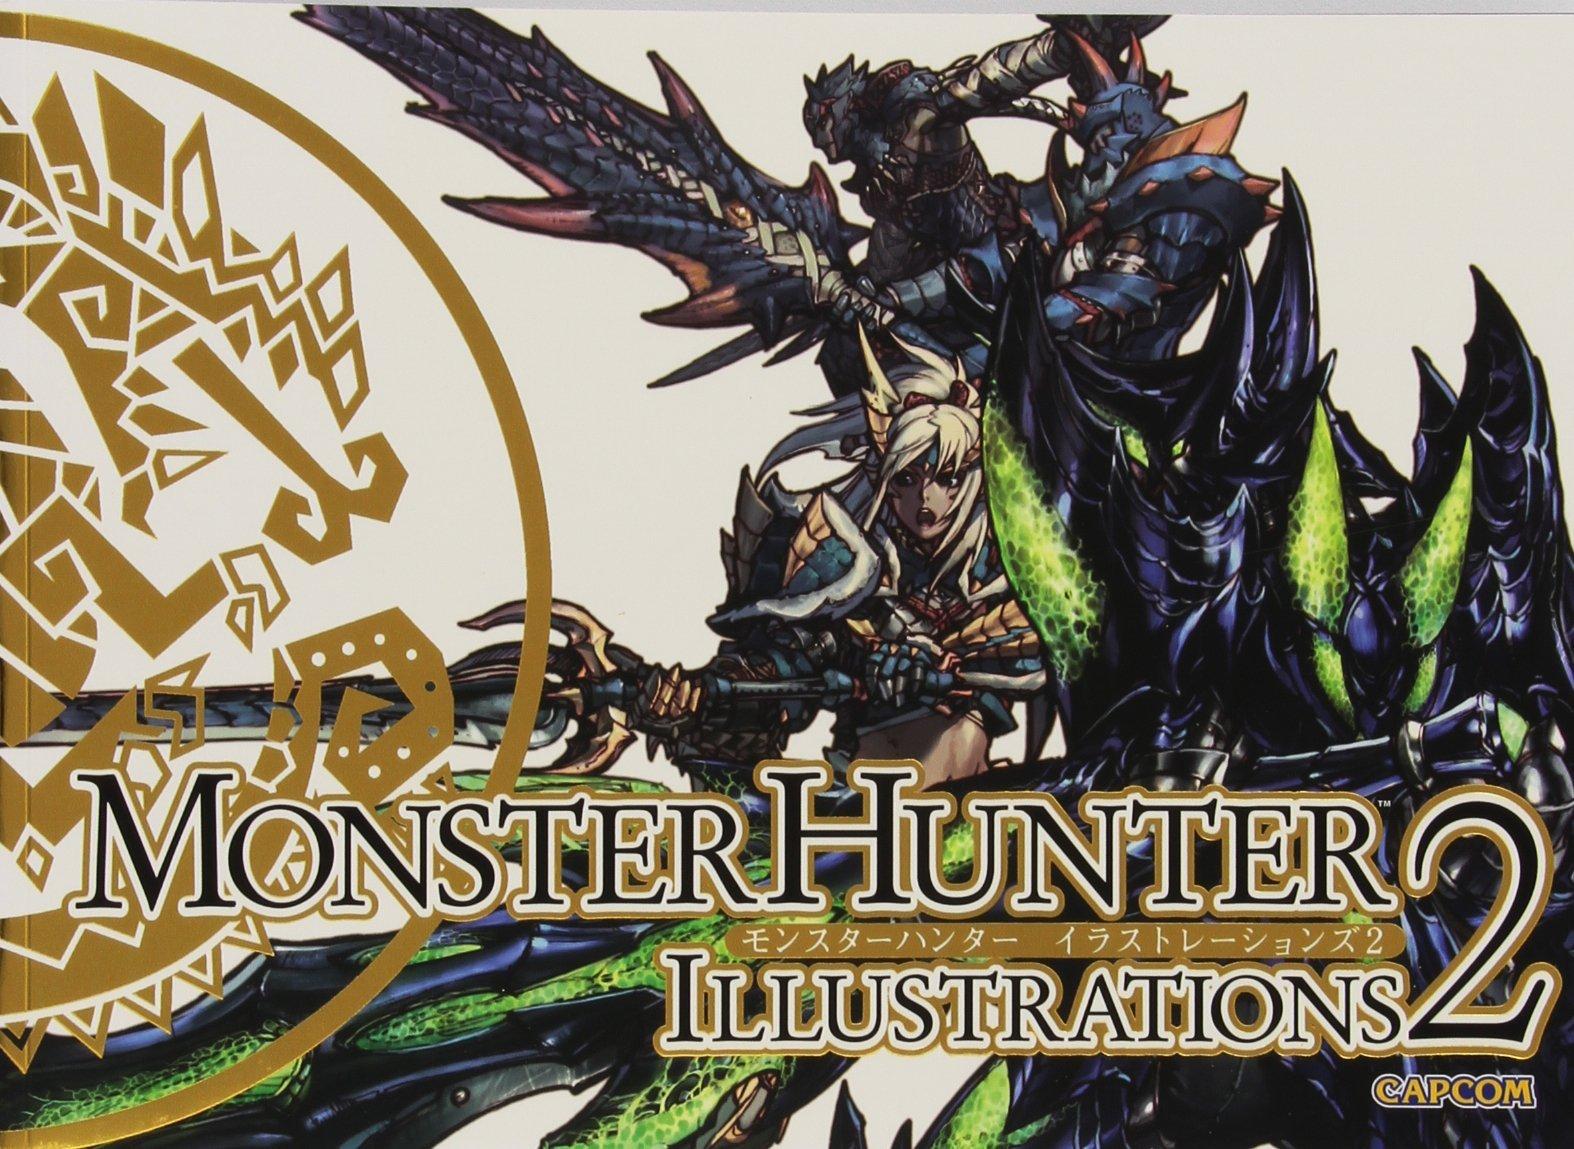 Monster Hunter Illustrations 2 by Capcom (13-Feb-2014